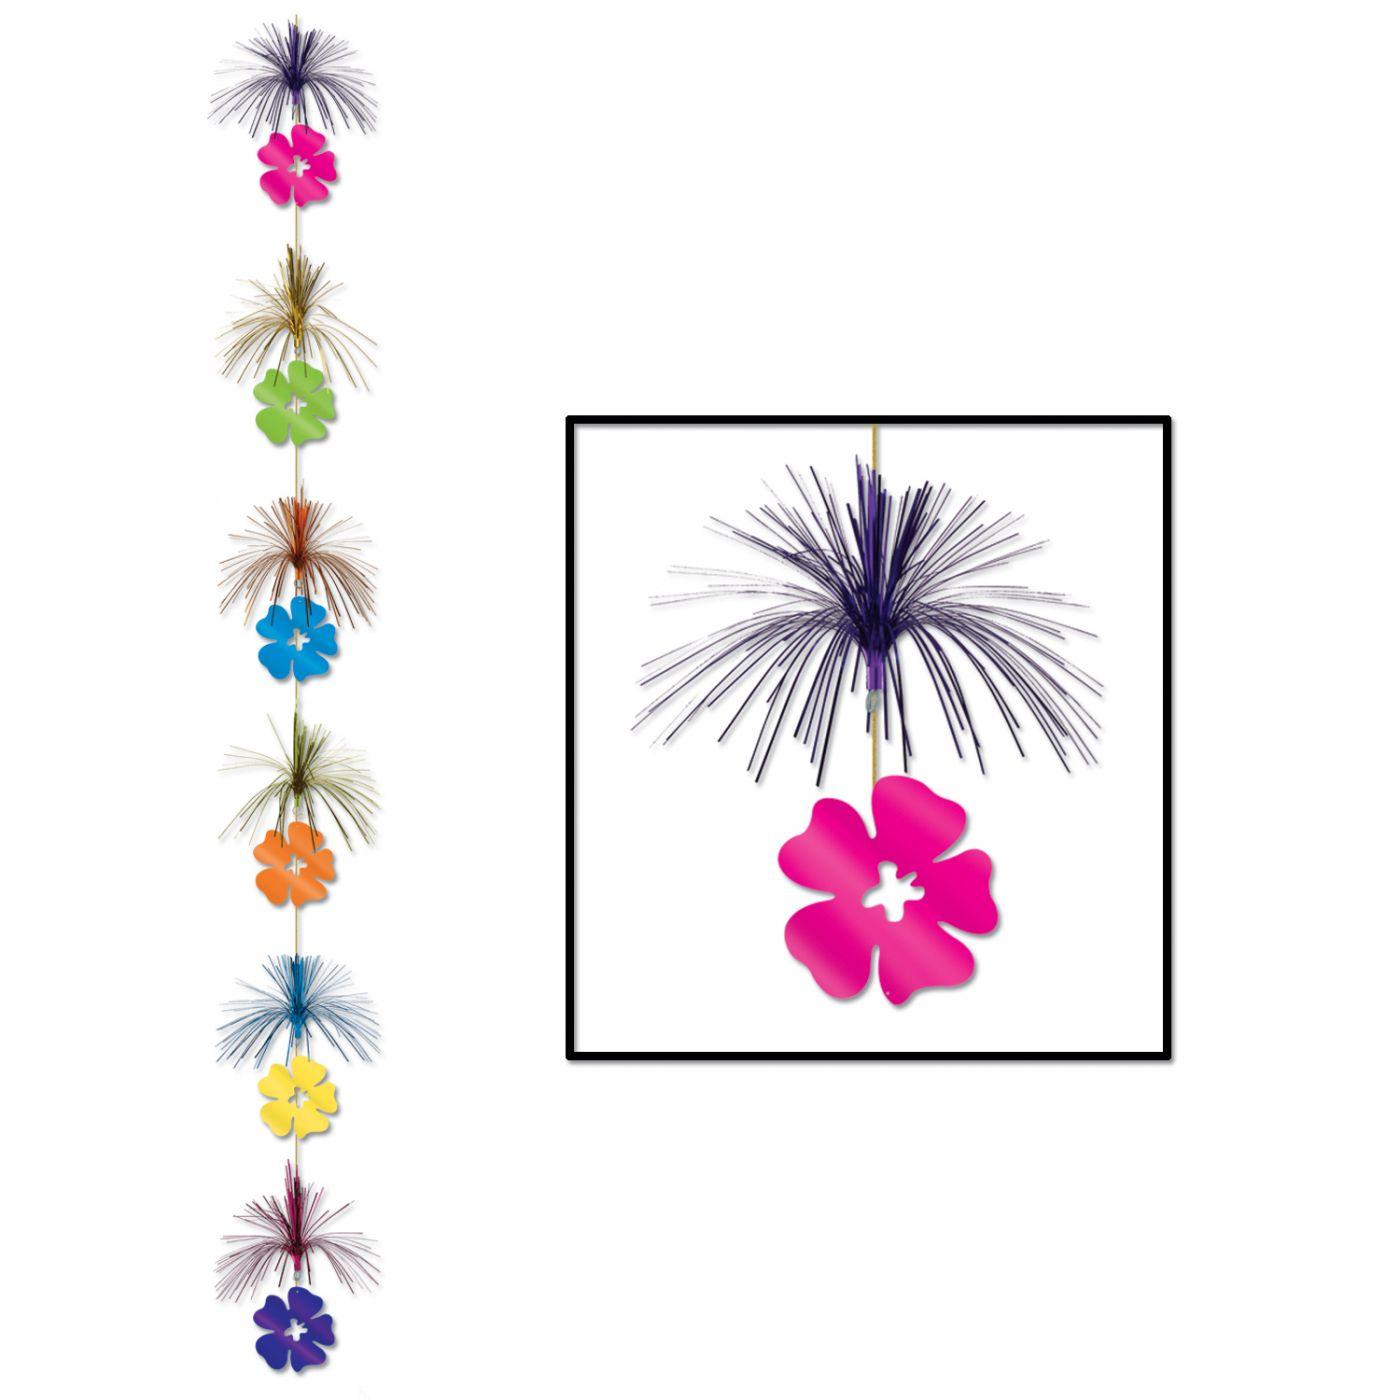 Hibiscus Firework Stringer image